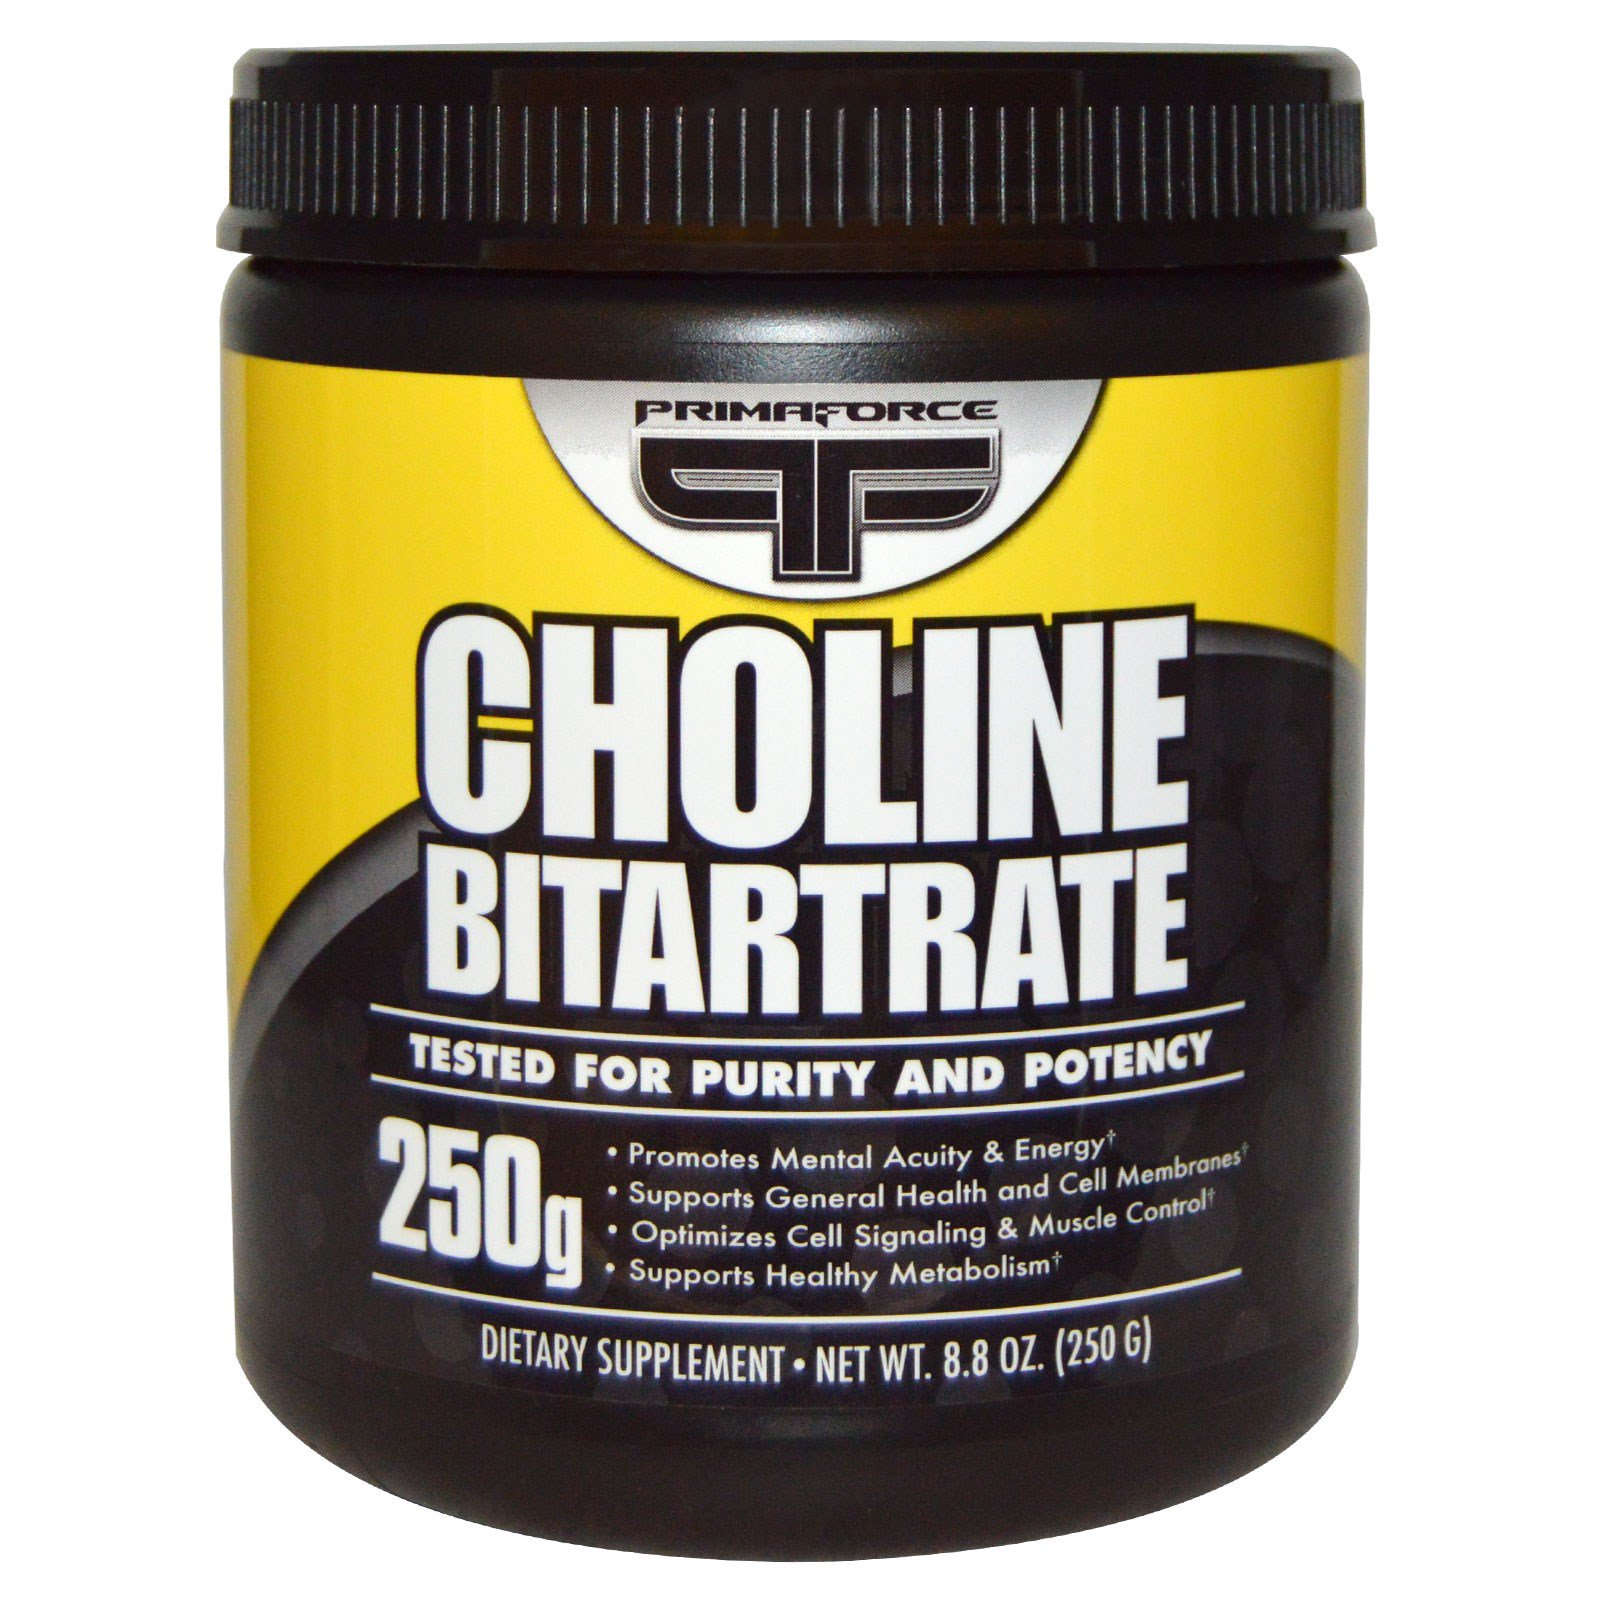 Primaforce, Choline Bitartrate, 8.8 oz (250 g)